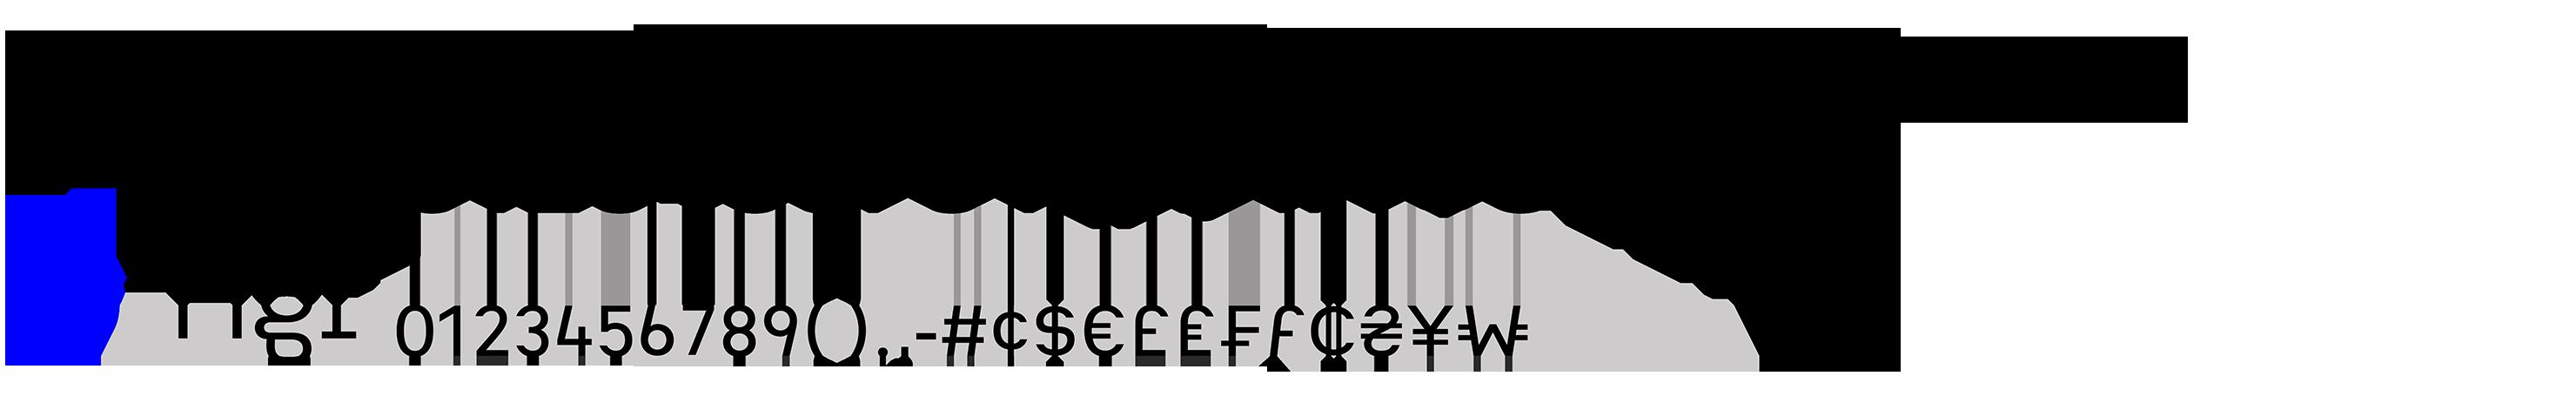 Typeface-Heimat-Sans-F13-Atlas-Font-Foundry